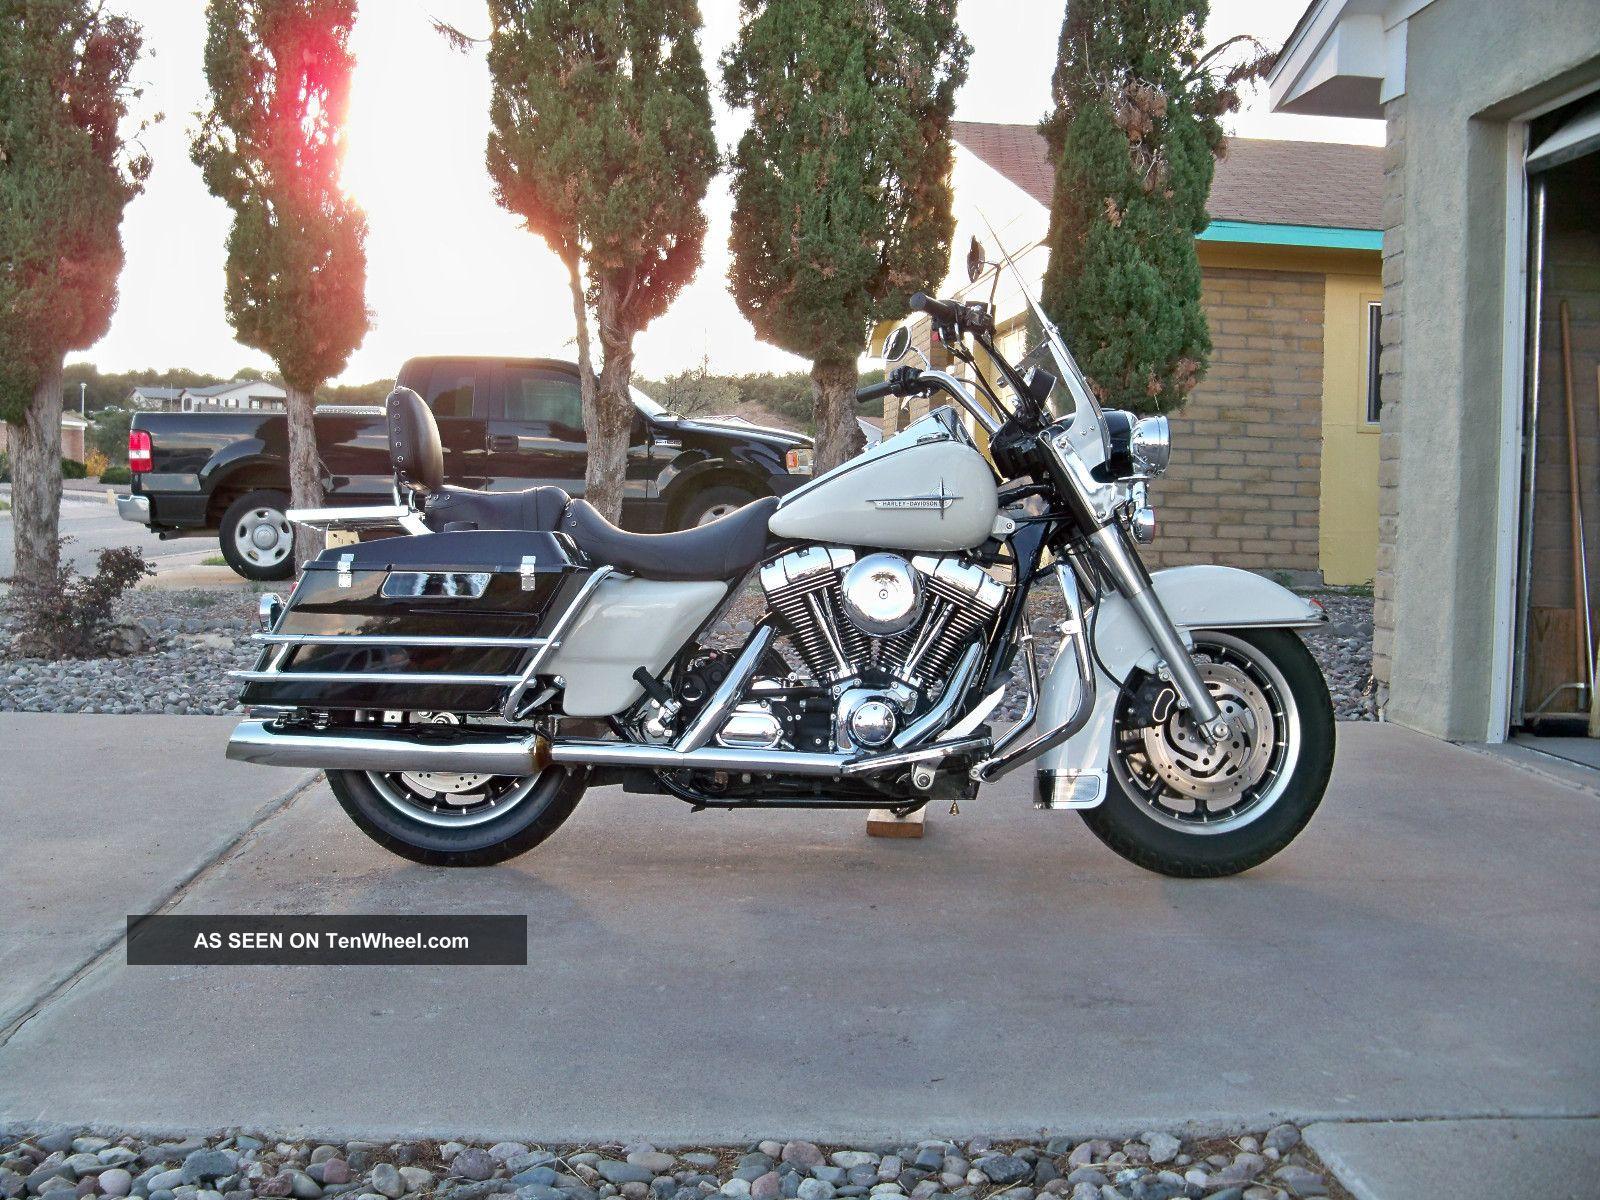 2005 Harley - Davidson Flhp Road King Touring photo